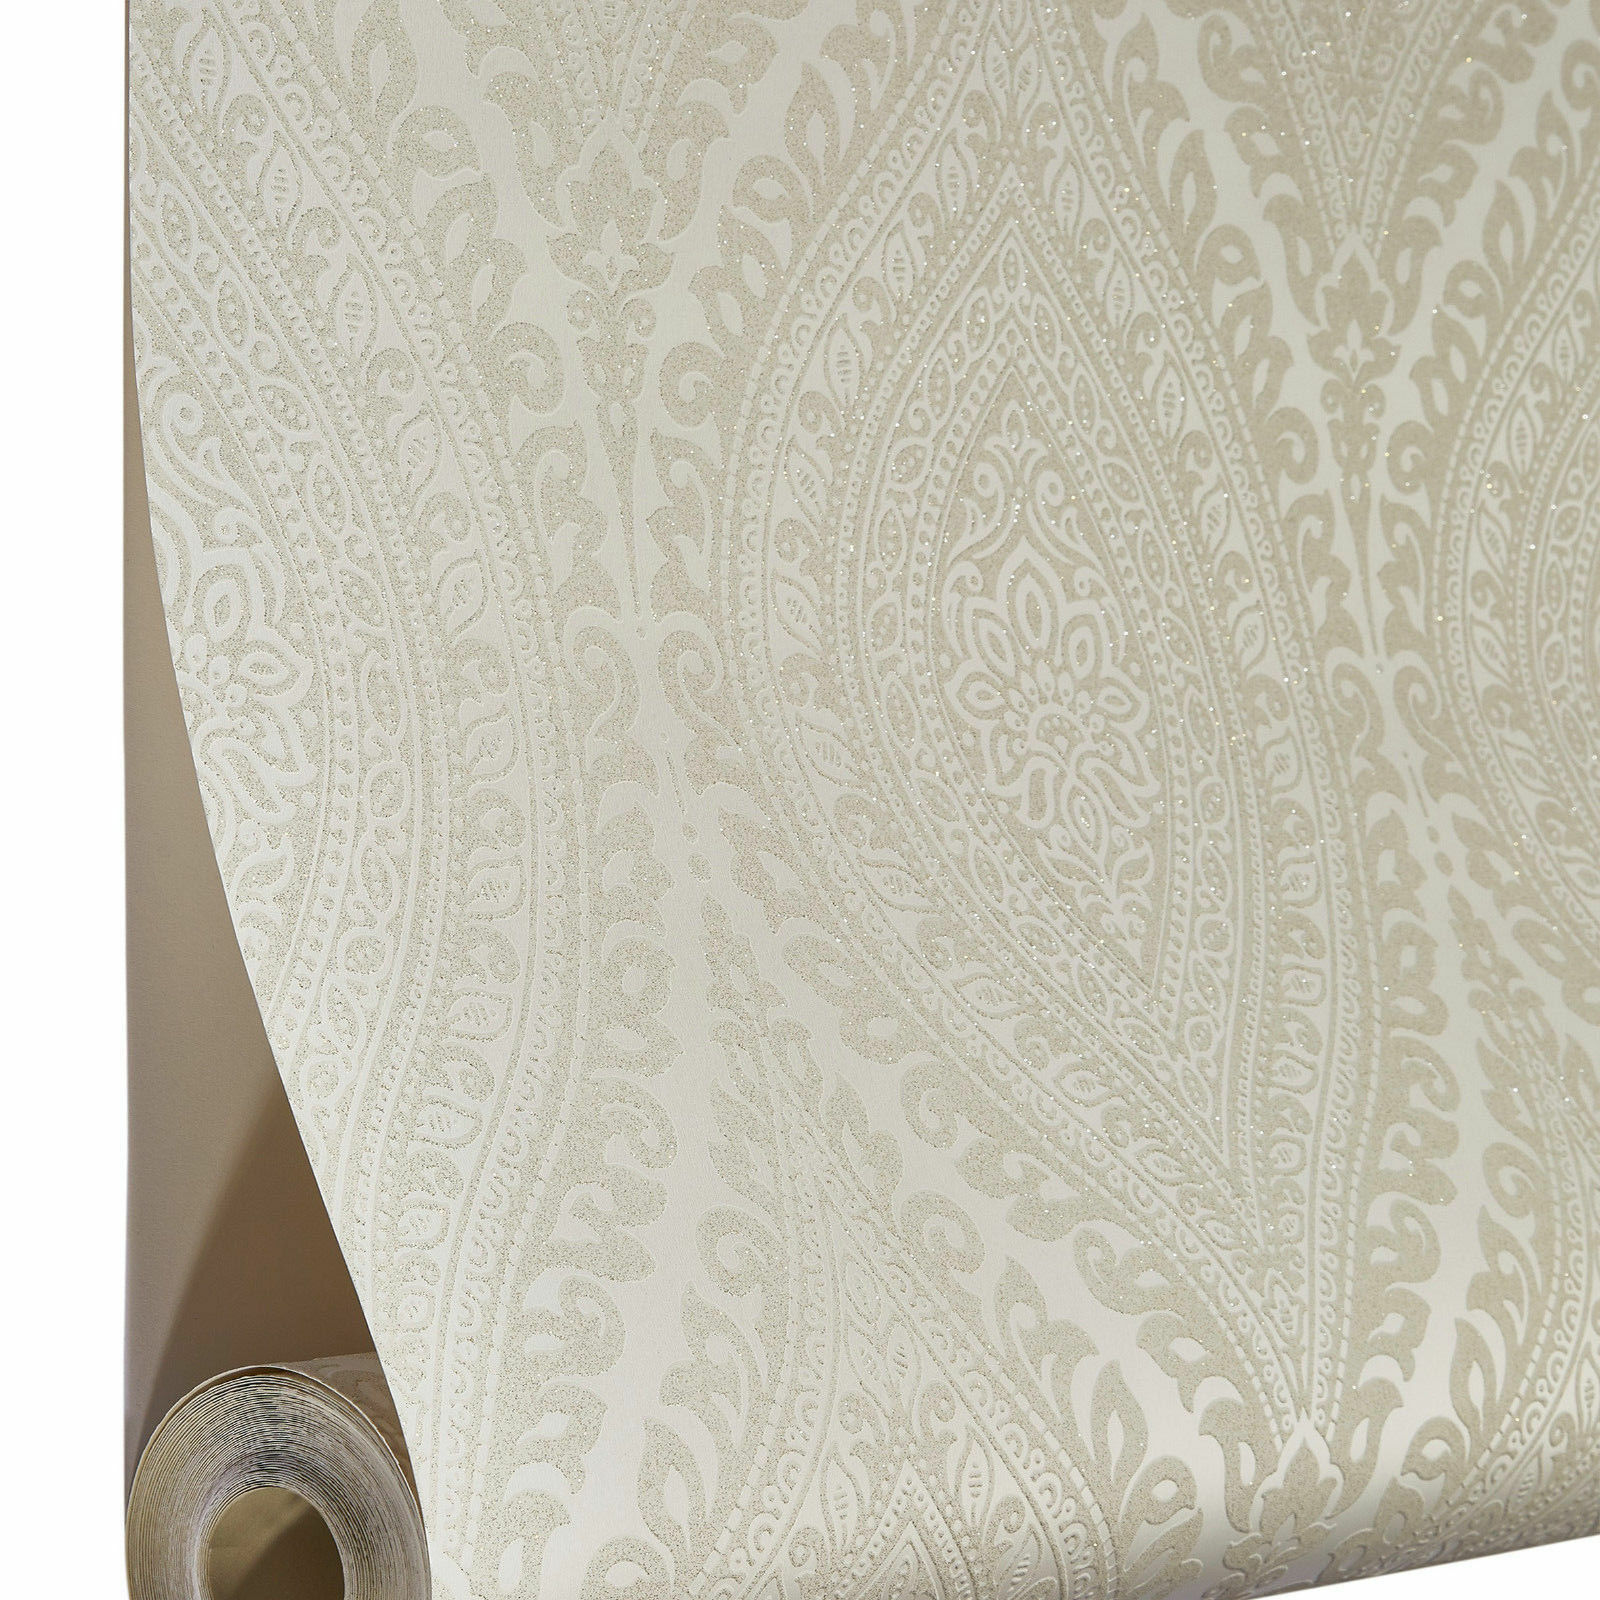 grandeco tapete luxus kismet damast mit glitzer creme beige a17701 ebay. Black Bedroom Furniture Sets. Home Design Ideas